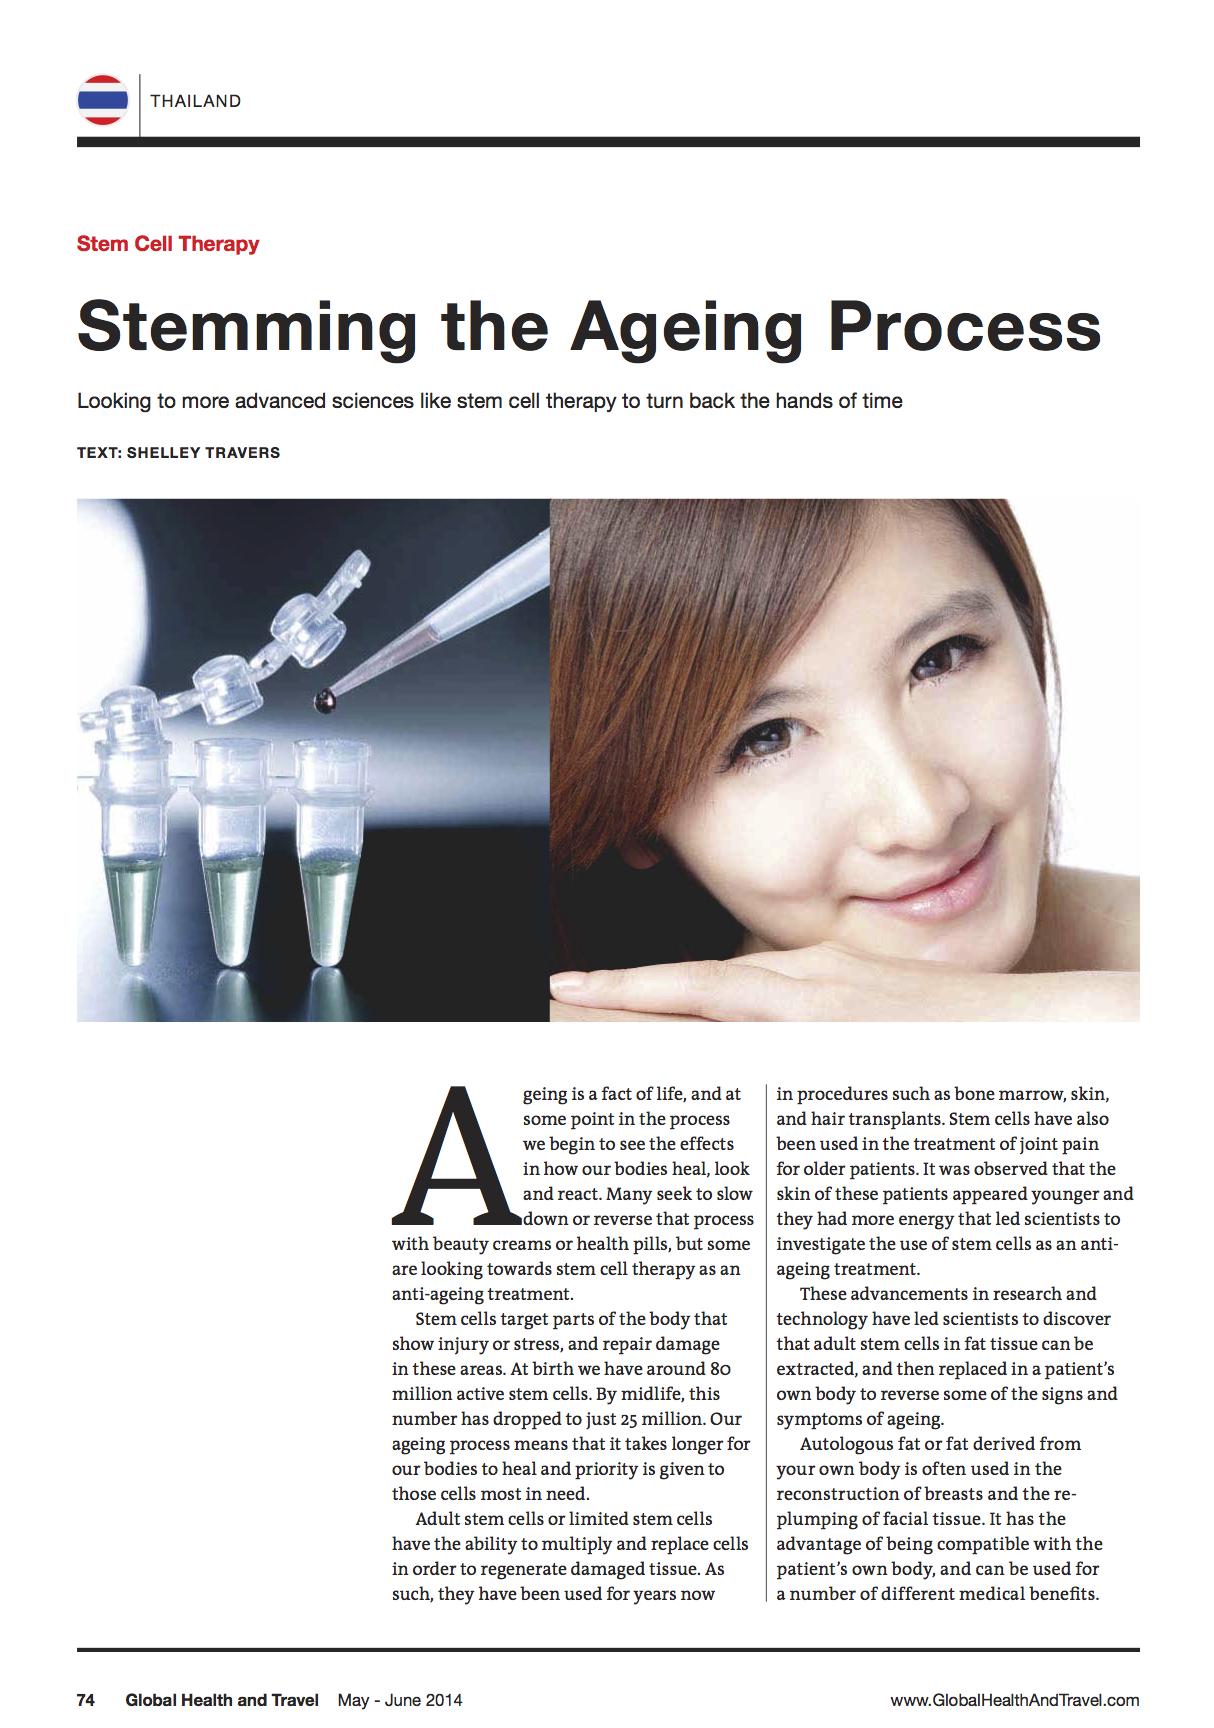 GHT15 Stem Cell Aesthetics Thailand Clipping copy.jpg